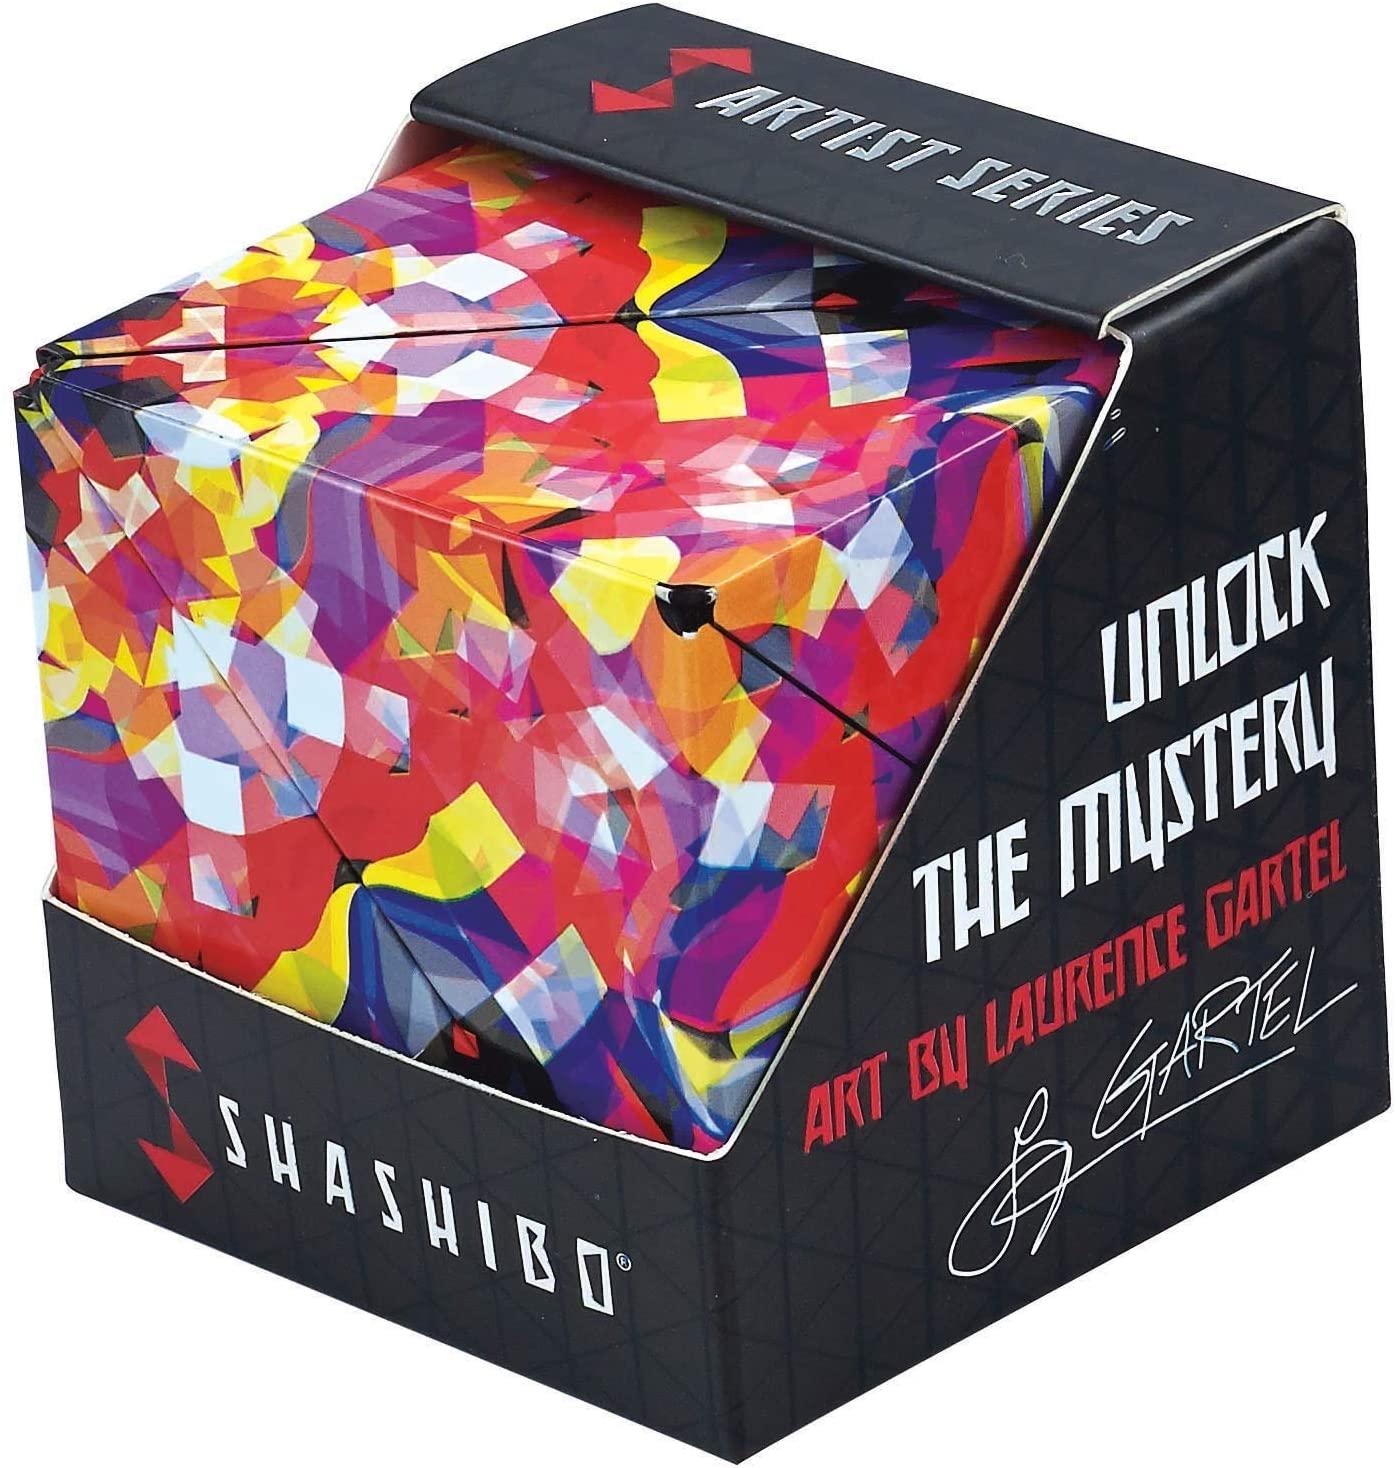 SHASHIBO - The Shape Shifting Box Artist Series (36 Rare Earth Magnets) - STEM/STEAM Fidget Geometric 3D Magnetic Transforming Magnetic Box Magic Cube (Confetti)